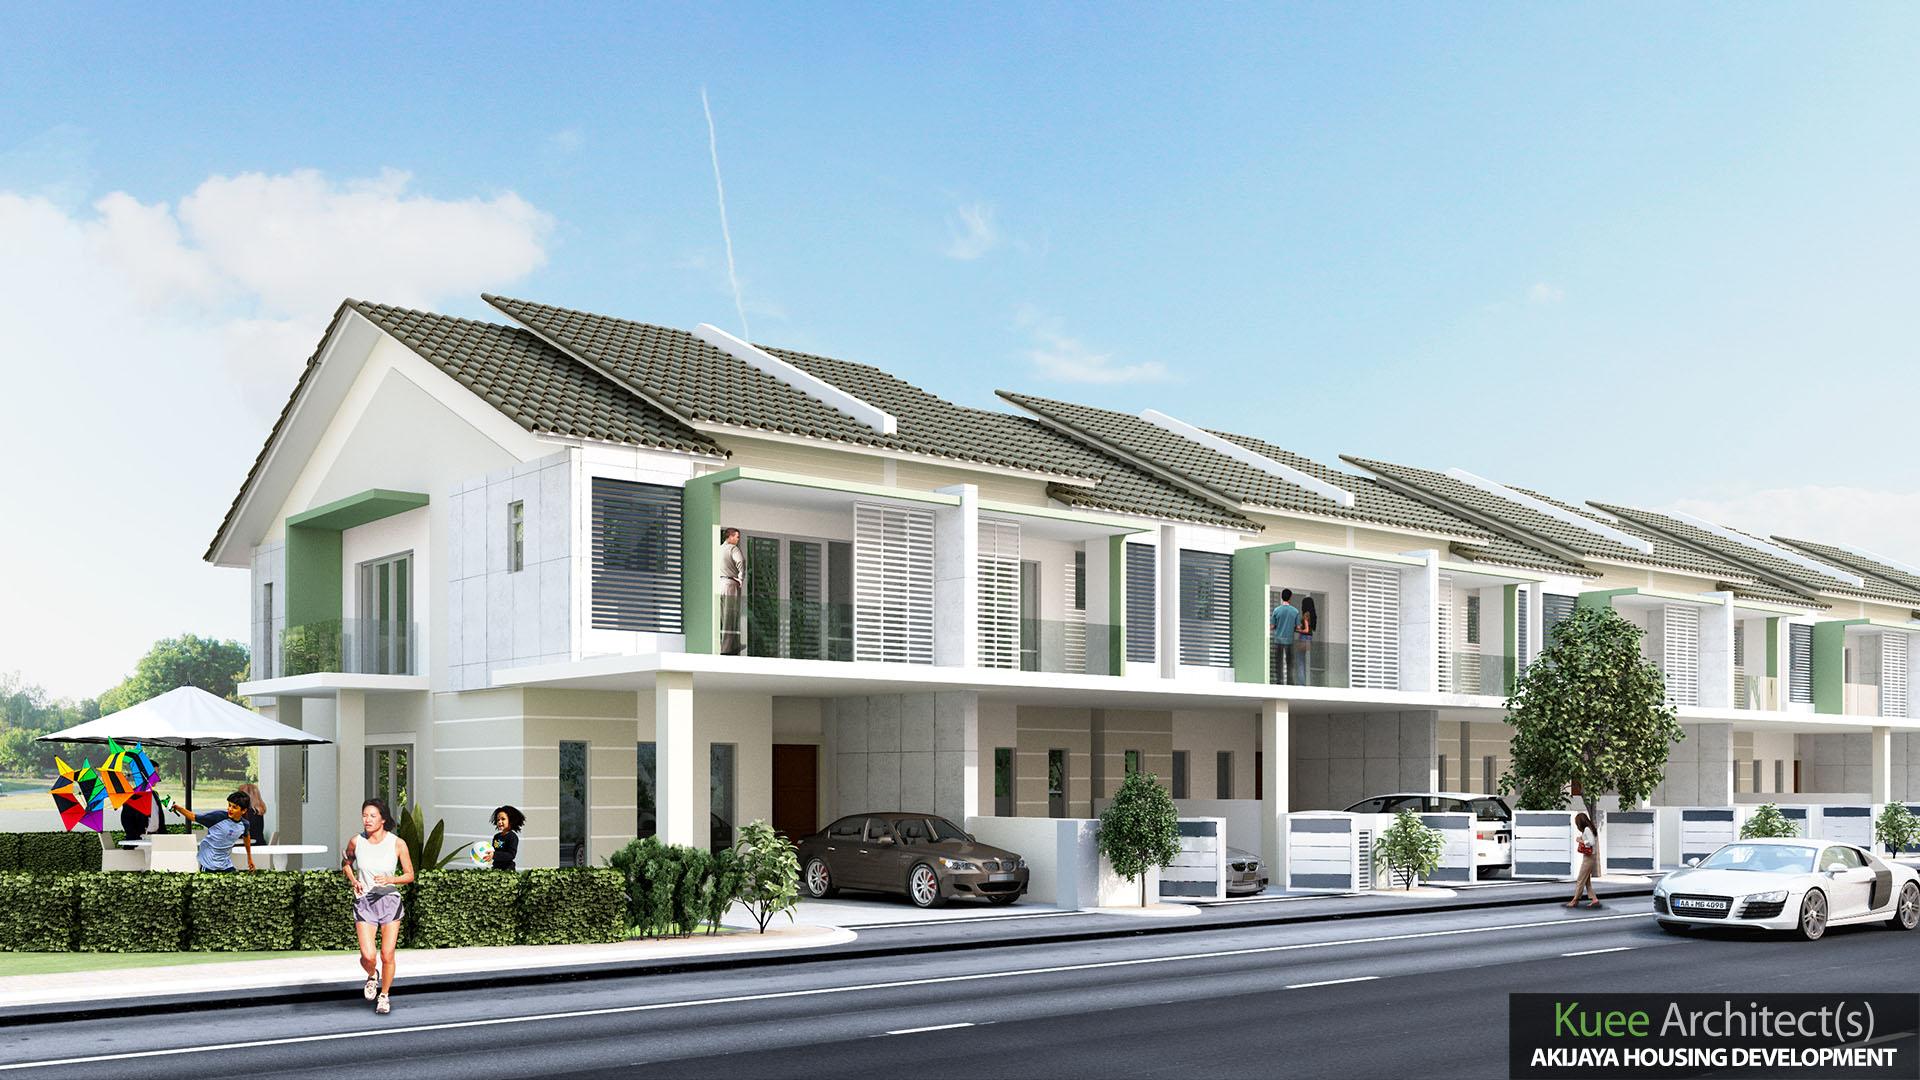 kuee-architect-semi-d-house-design-architecture-property-concept (2)